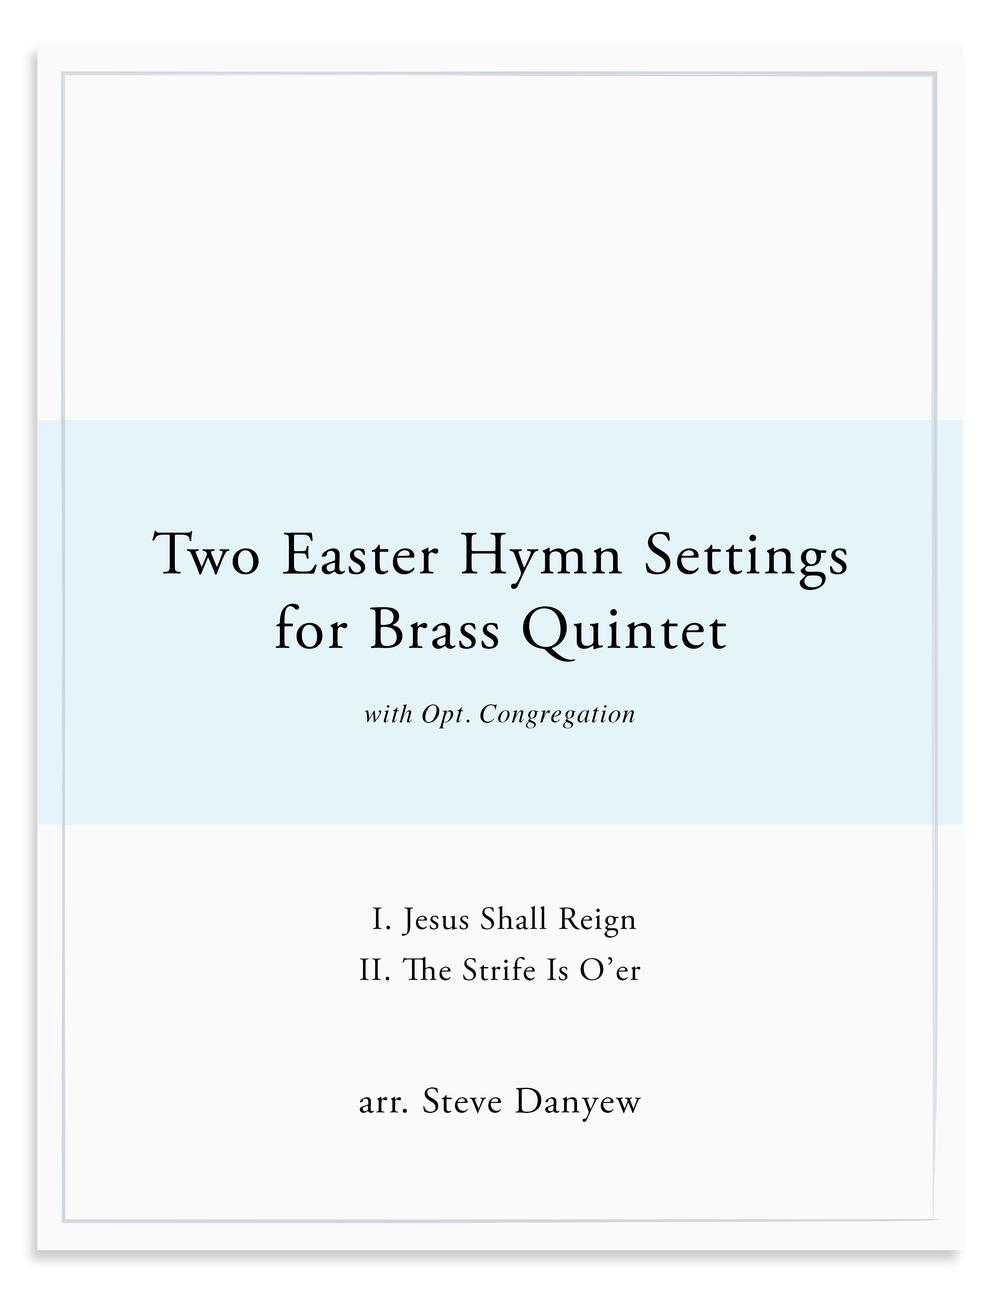 Two Easter Hymn Settings for Brass Quintet